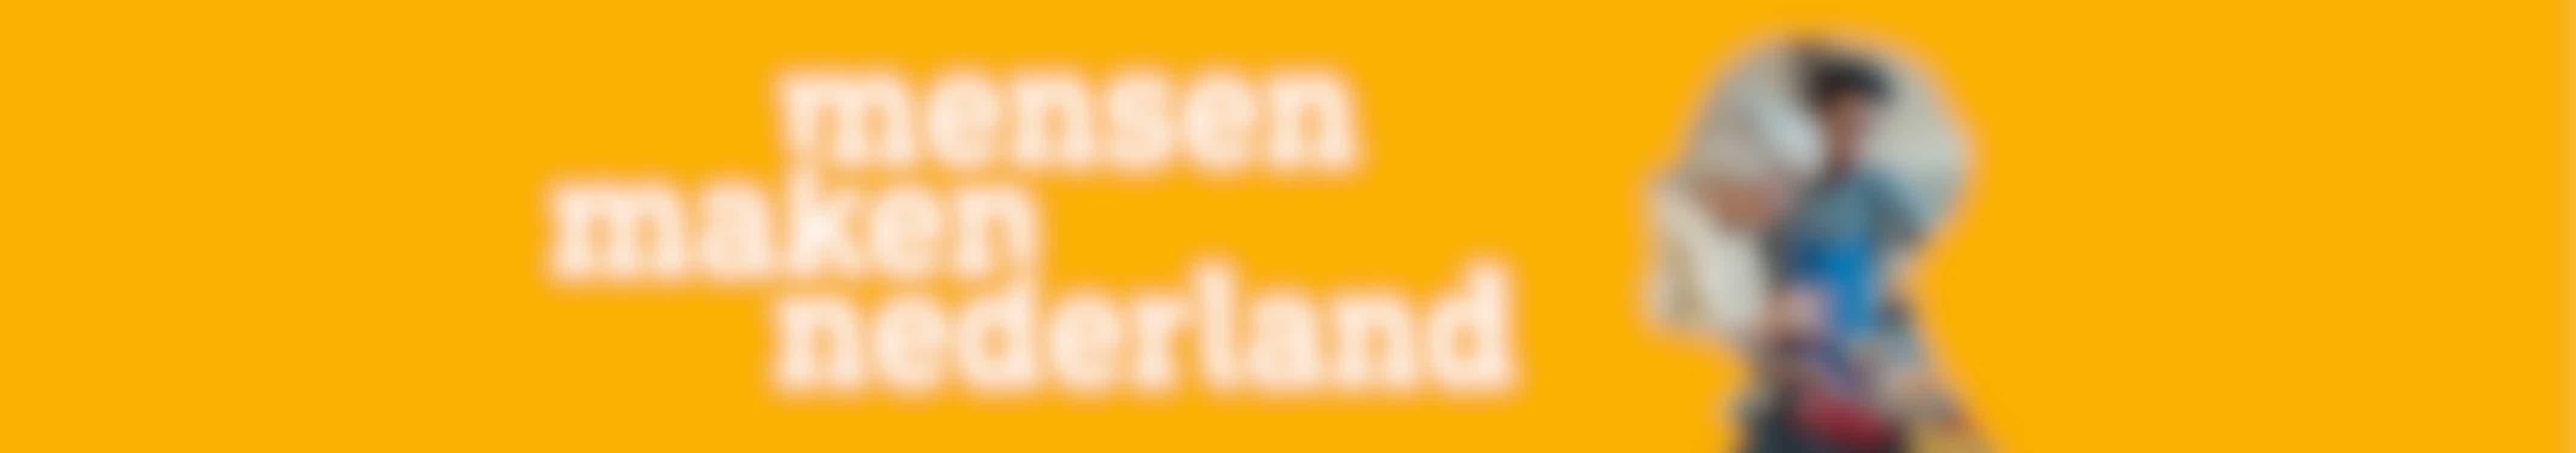 Banner Mensen maken Nederland